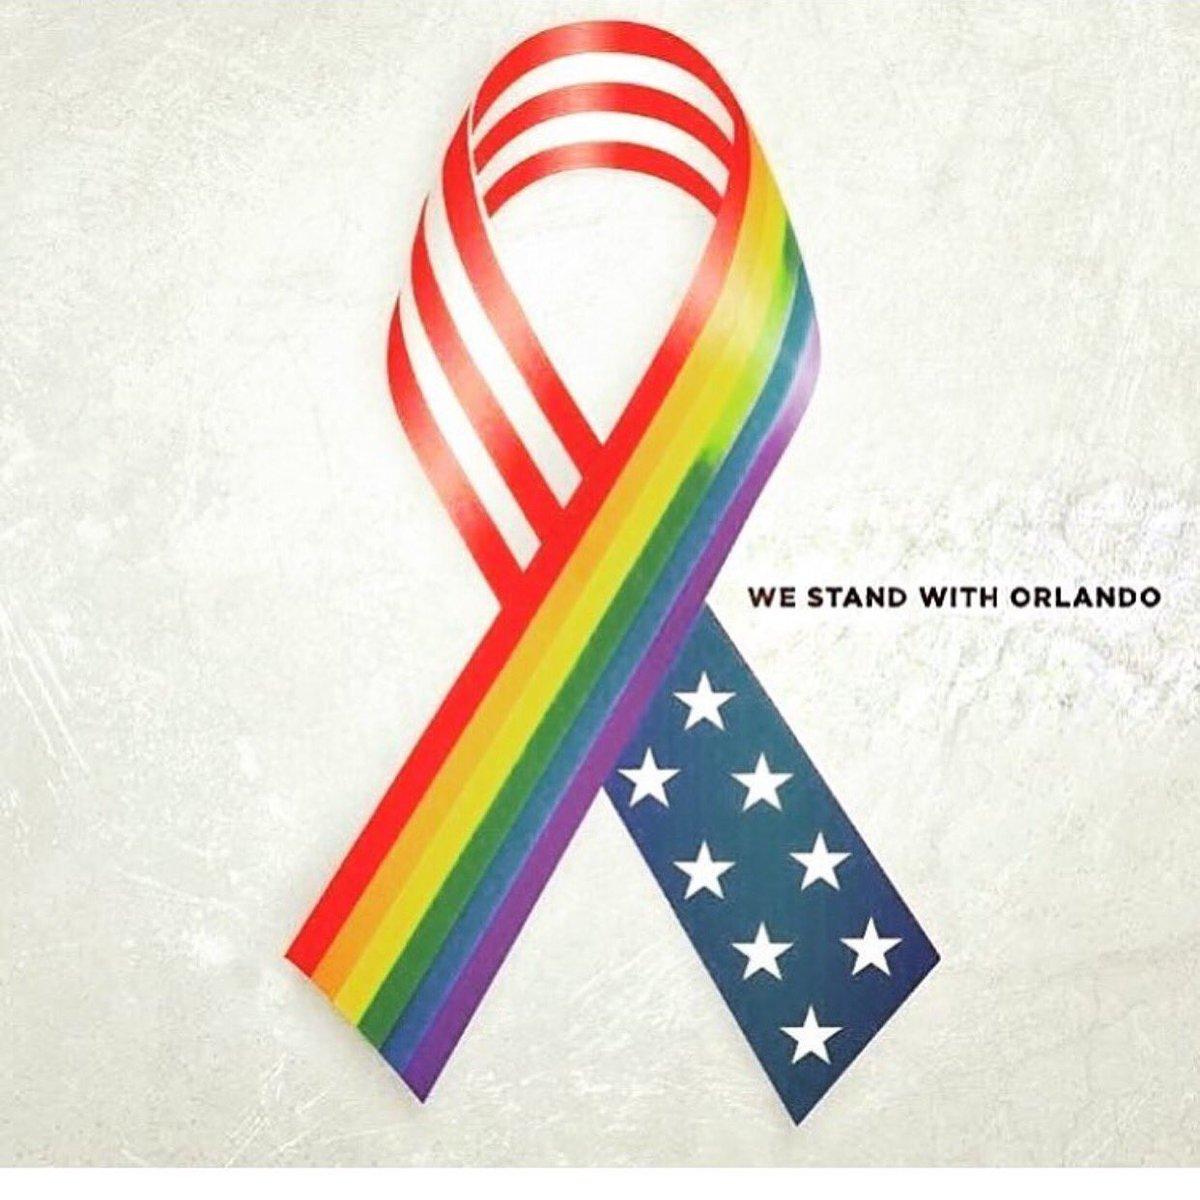 #OrlandoShooting